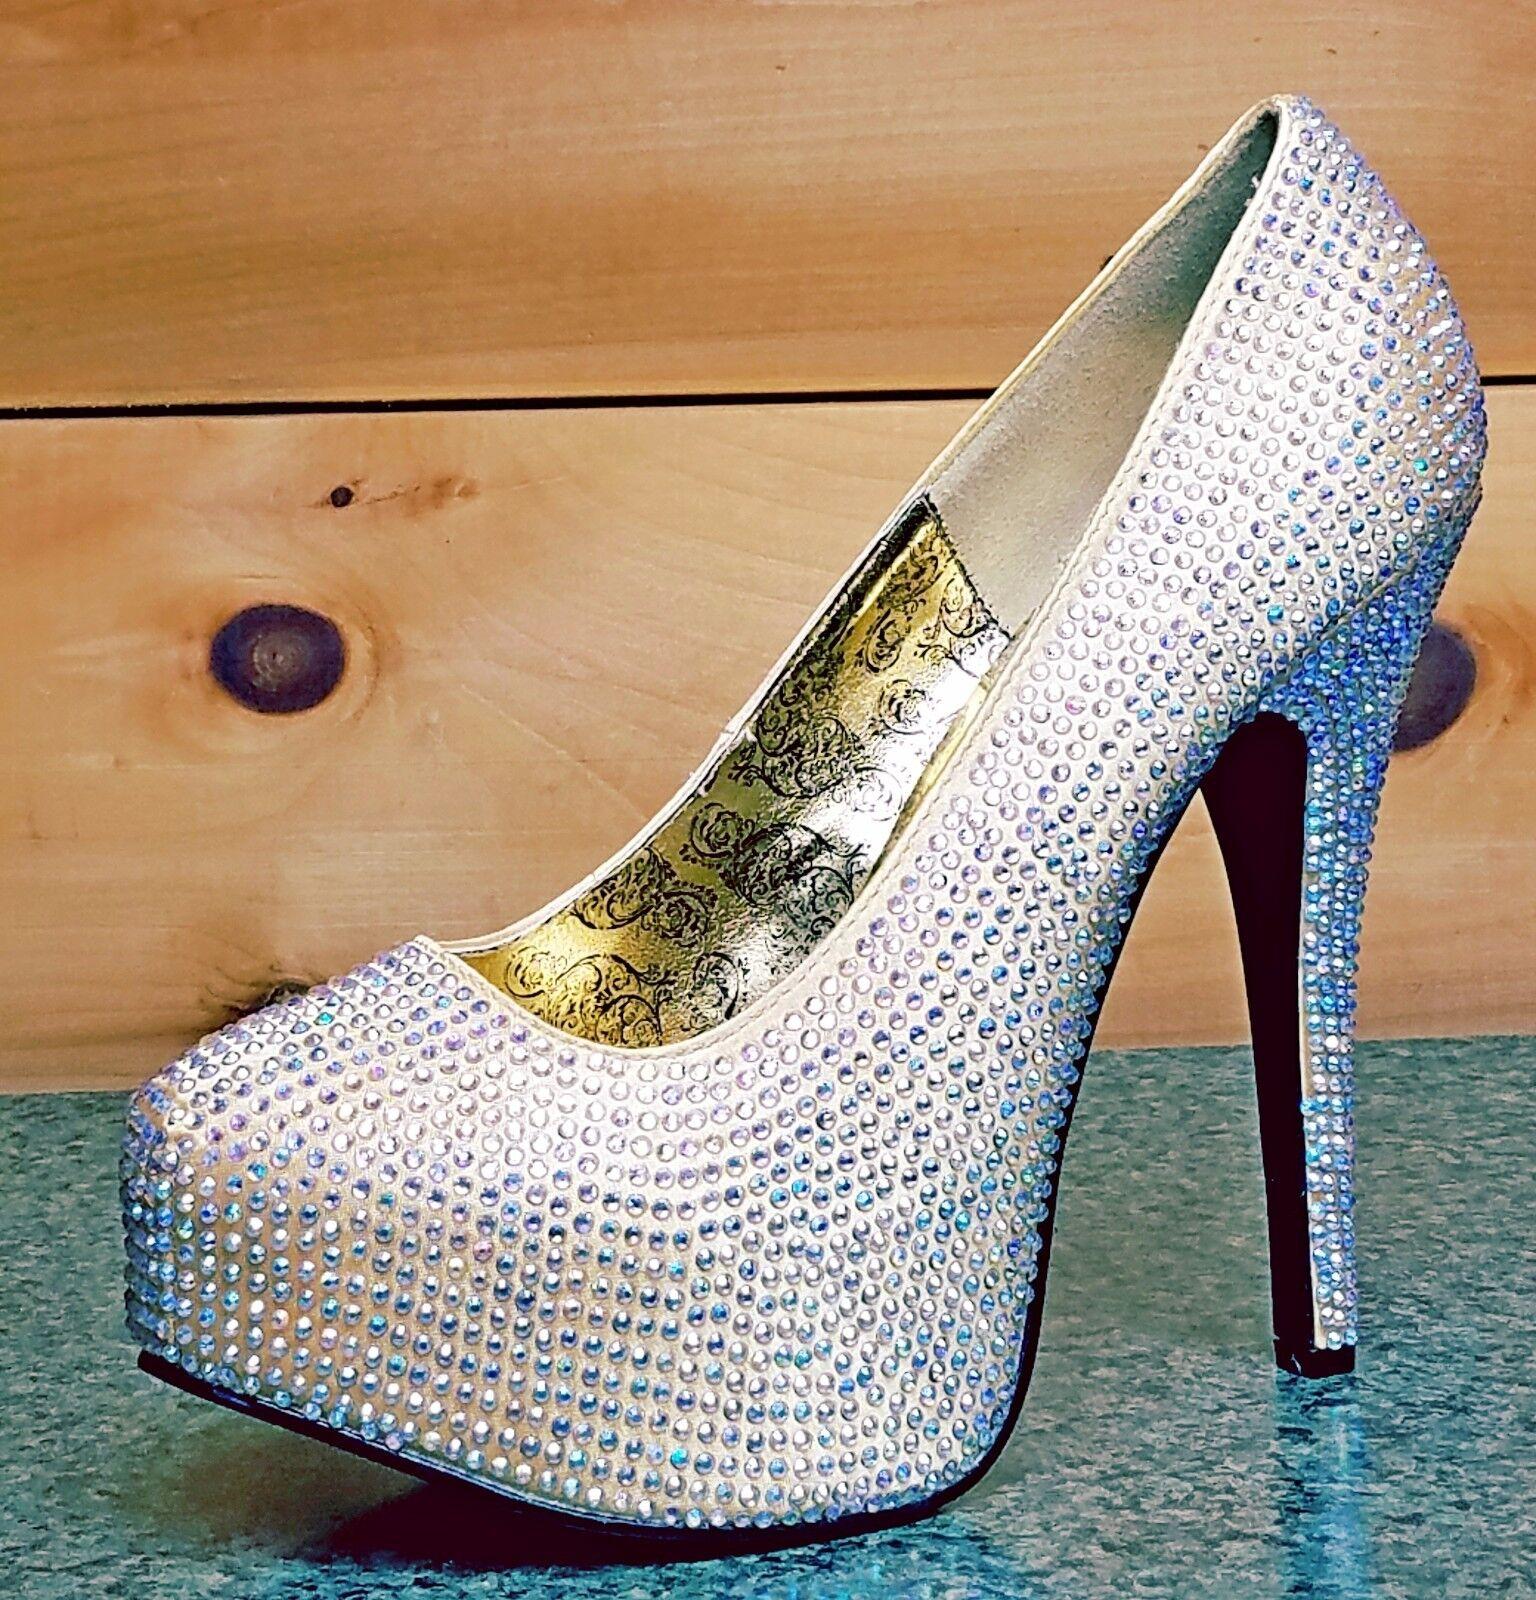 basso prezzo del 40% Teeze Teeze Teeze 06R Iridescent Rhinestone Platform Pump oro Satin scarpe Dimensione 11  nuovo sadico